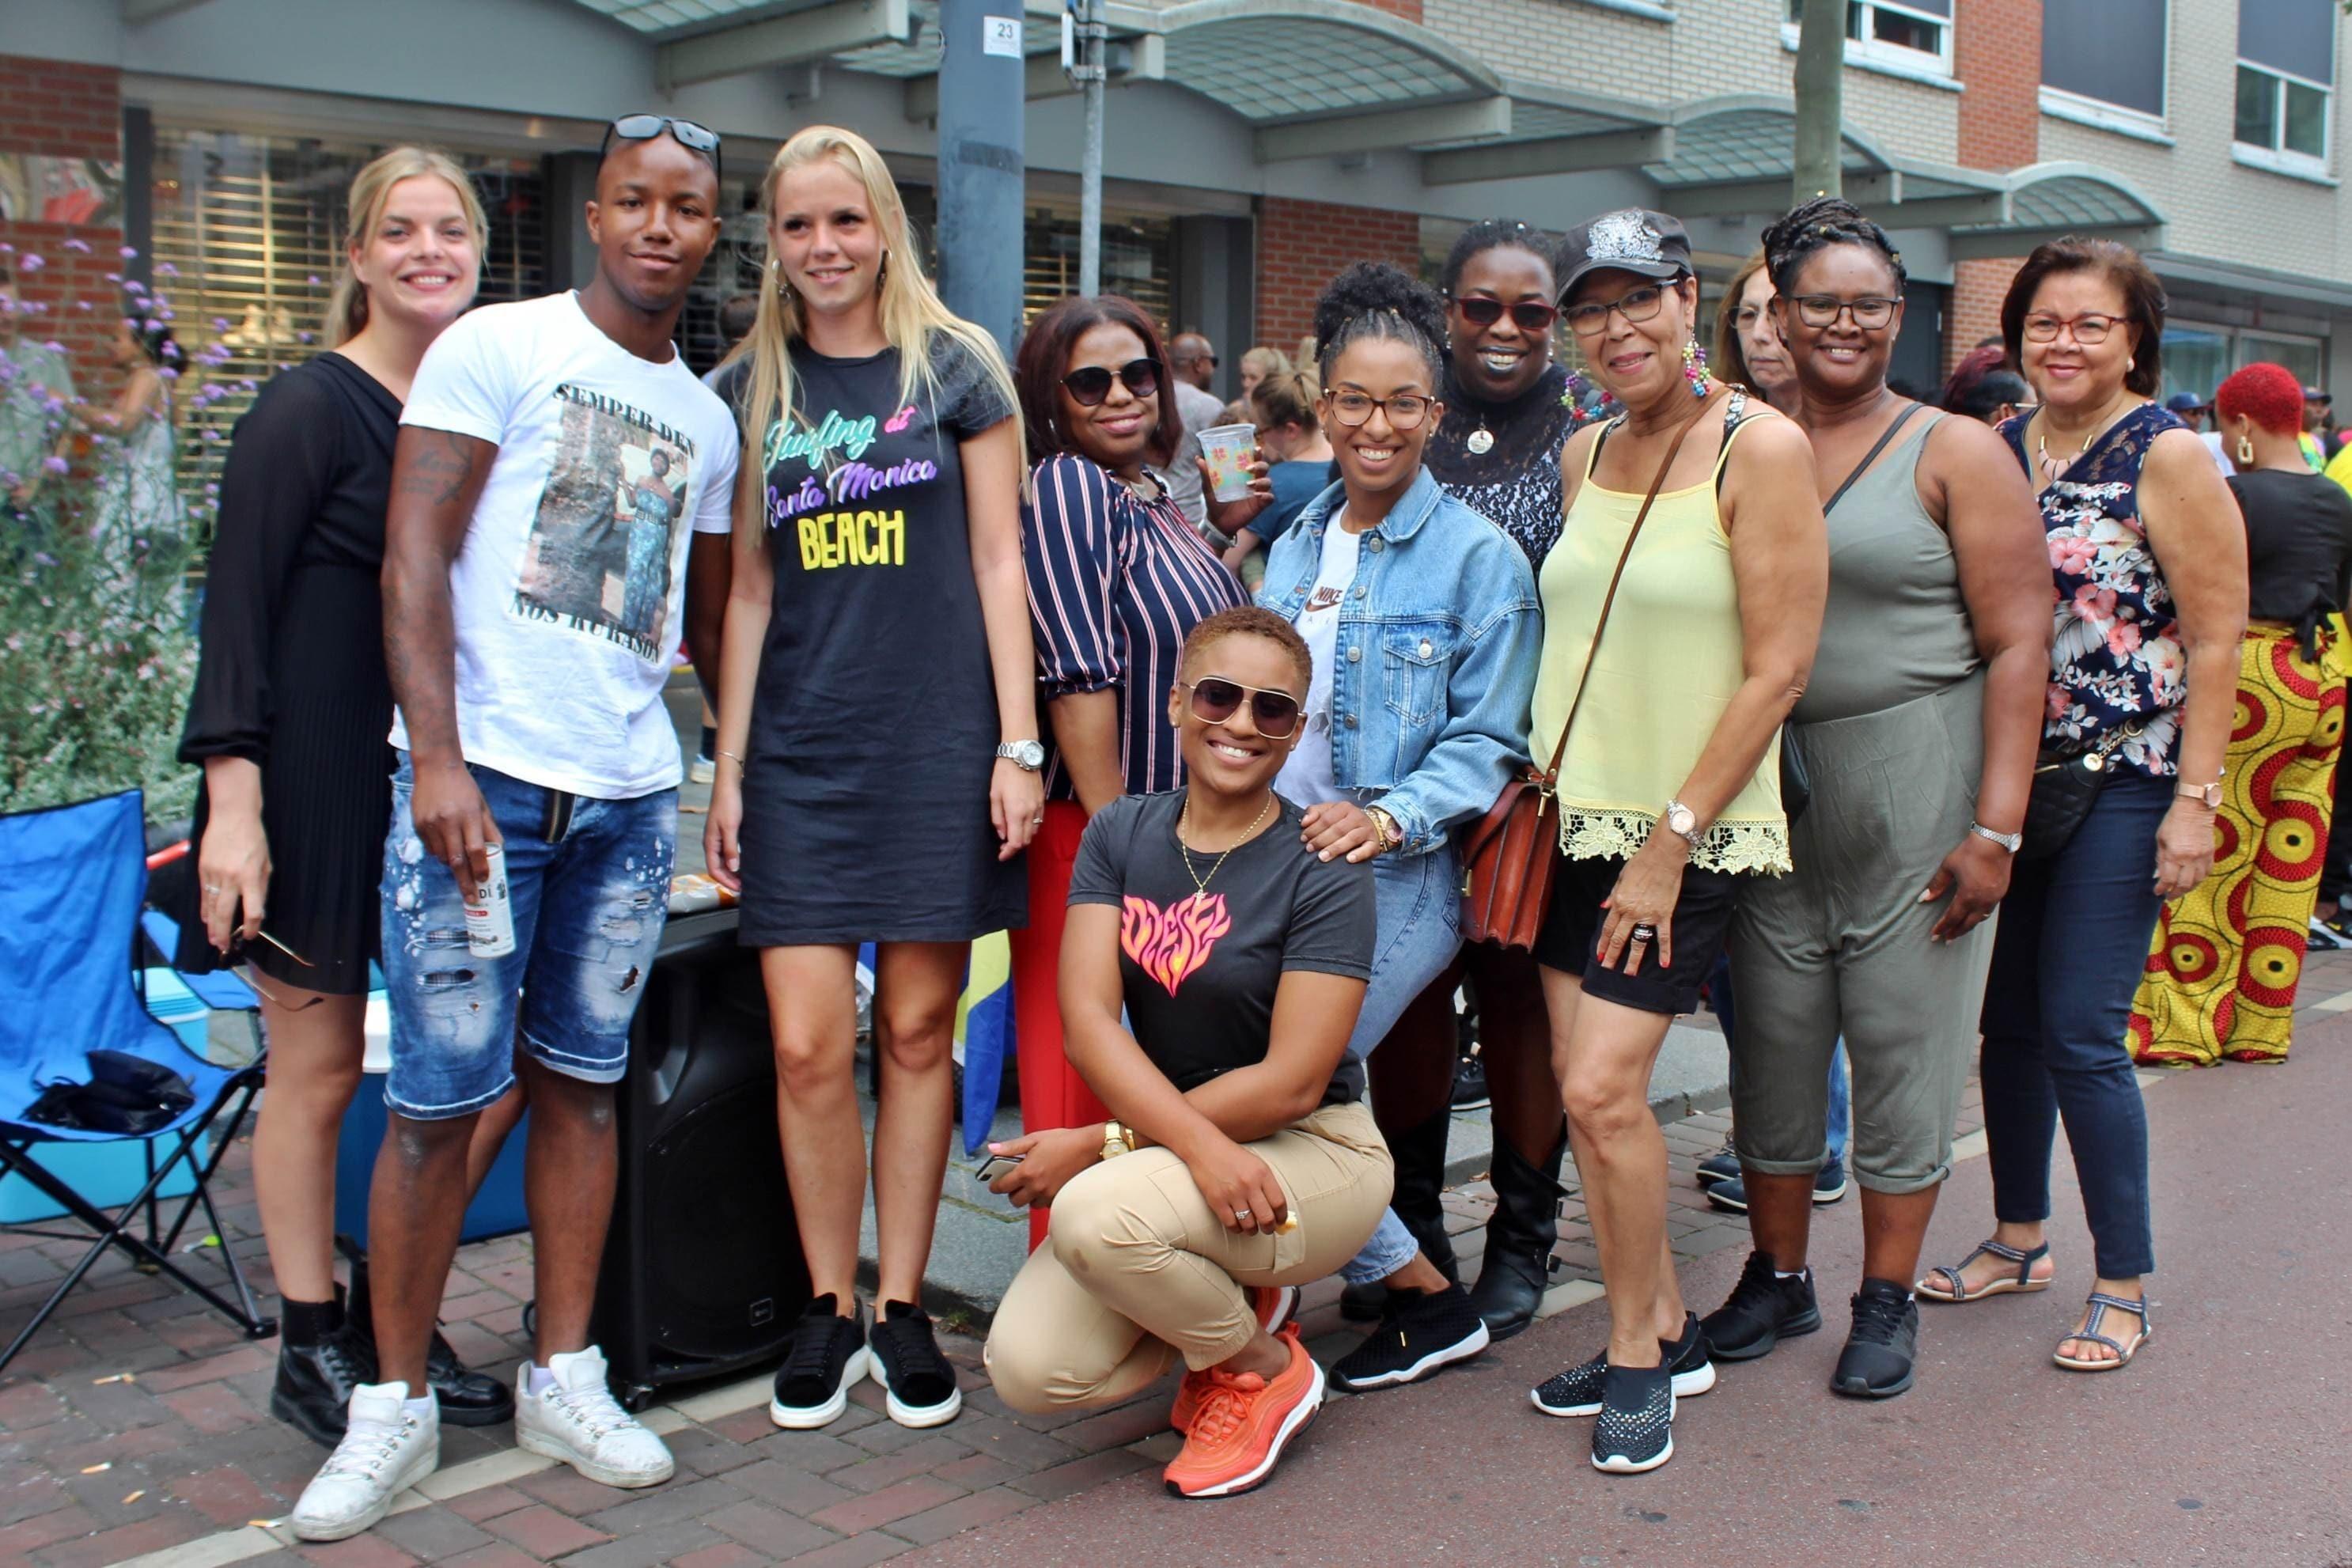 Rotterdam zomercarnaval 2019 1 min